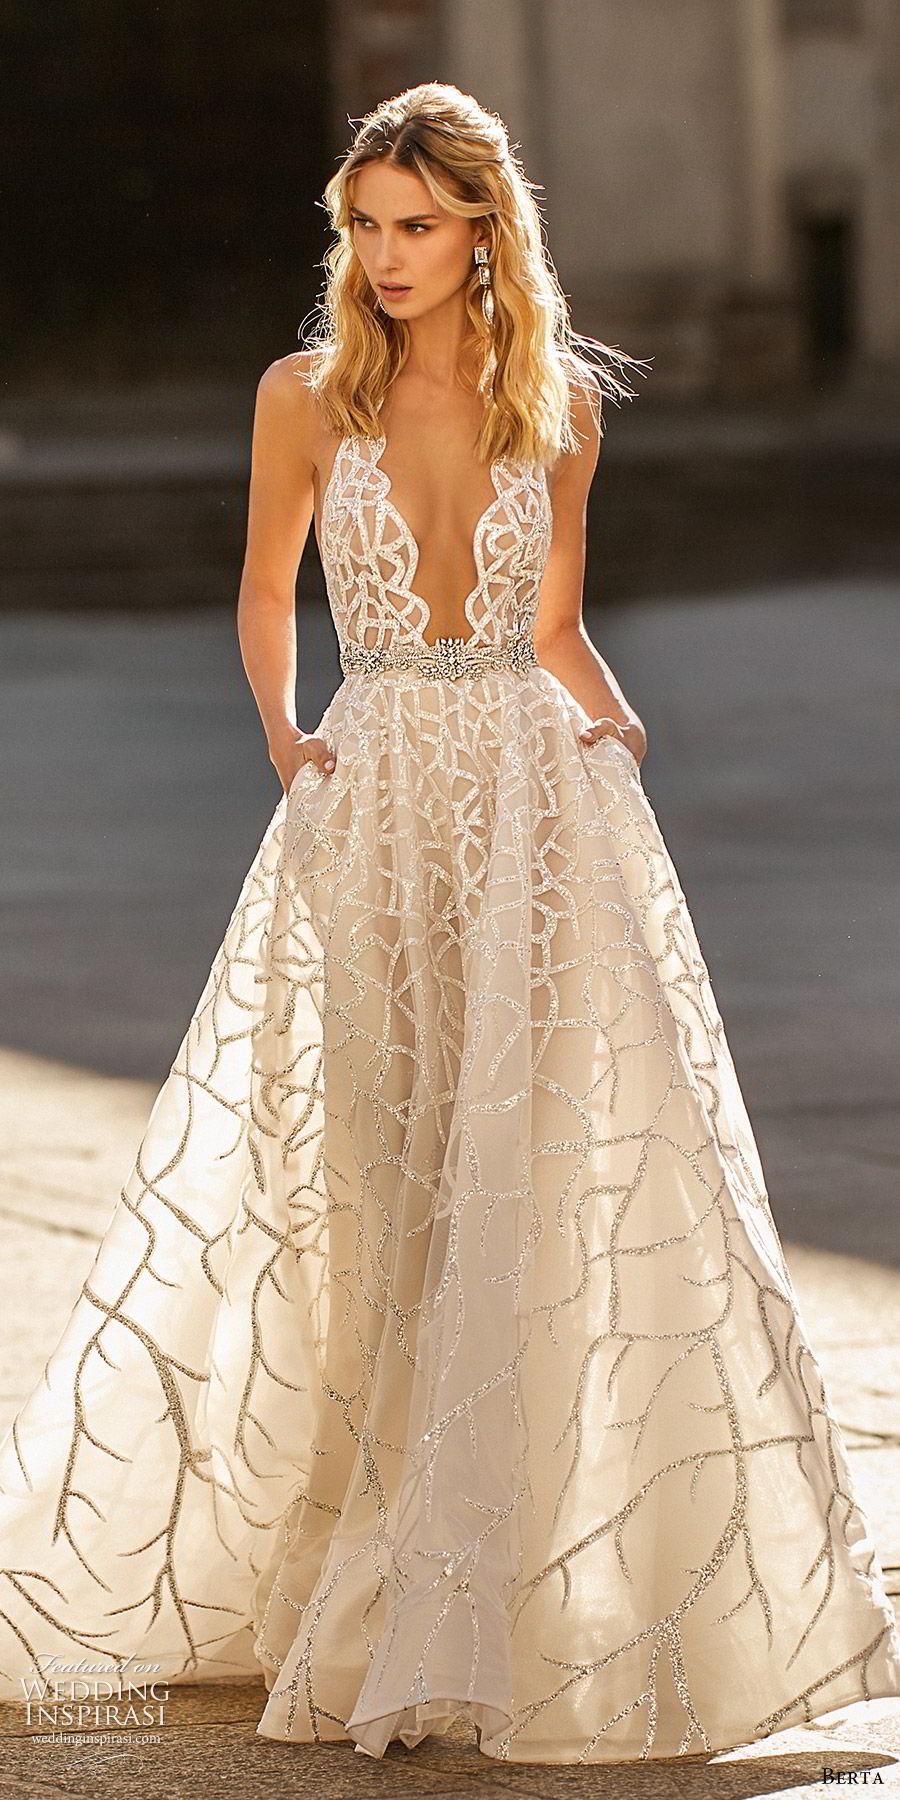 berta spring 2020 bridal sleeveless hatler neck plunging neckline fully embellished a line ball gown wedding dress (14) champagne glitzy princess chapel train mv